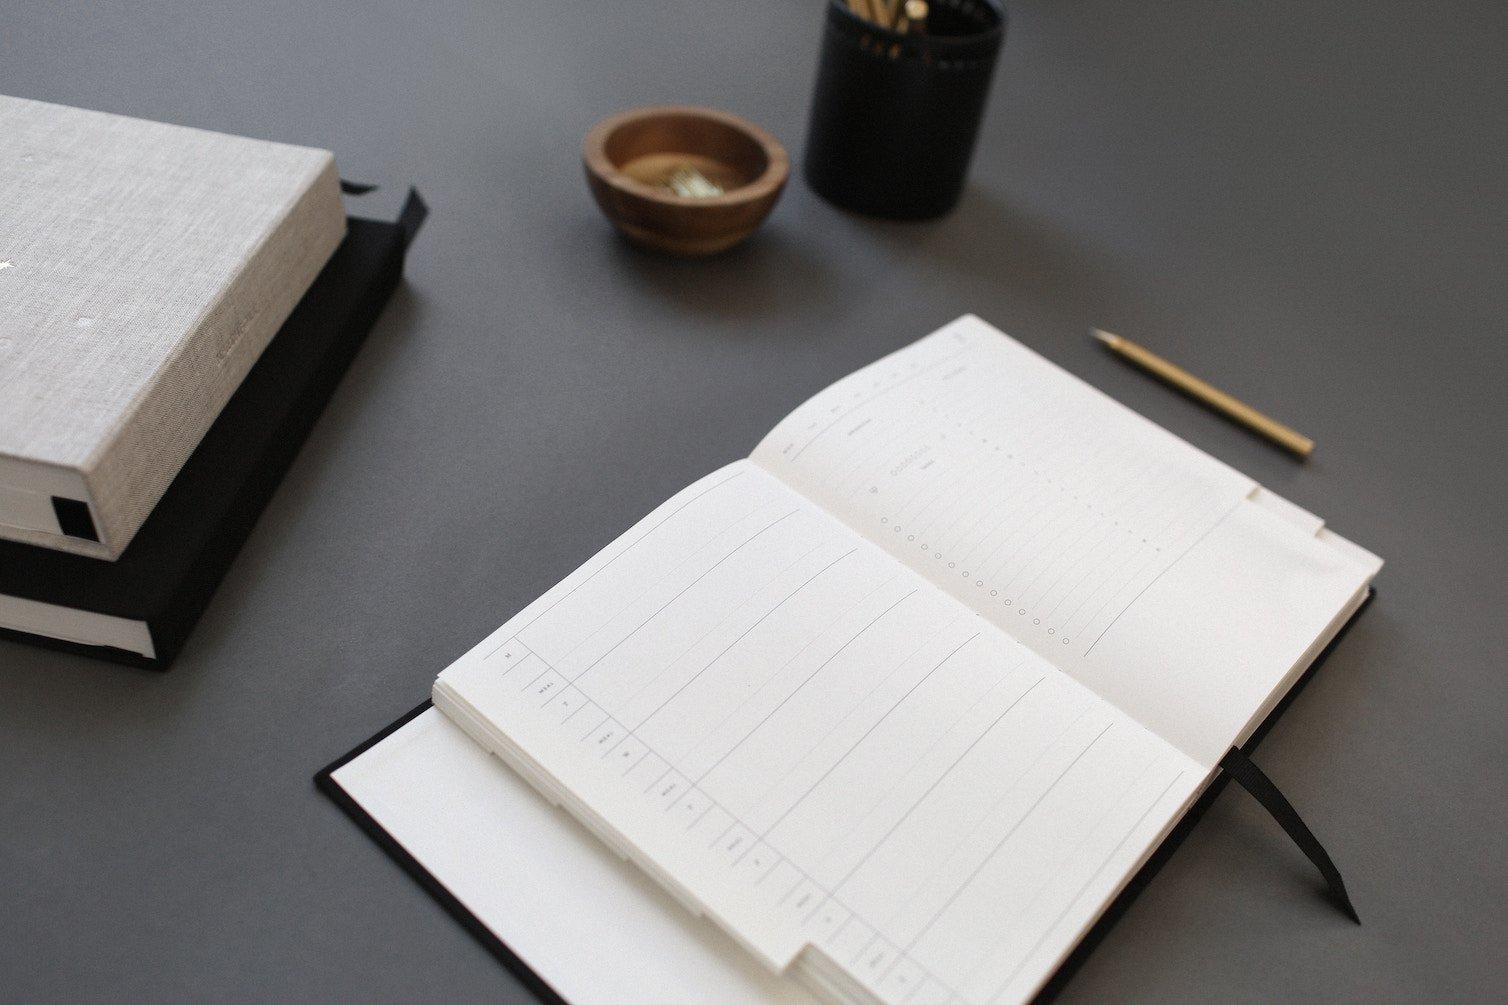 Notebook - National Stationary Week